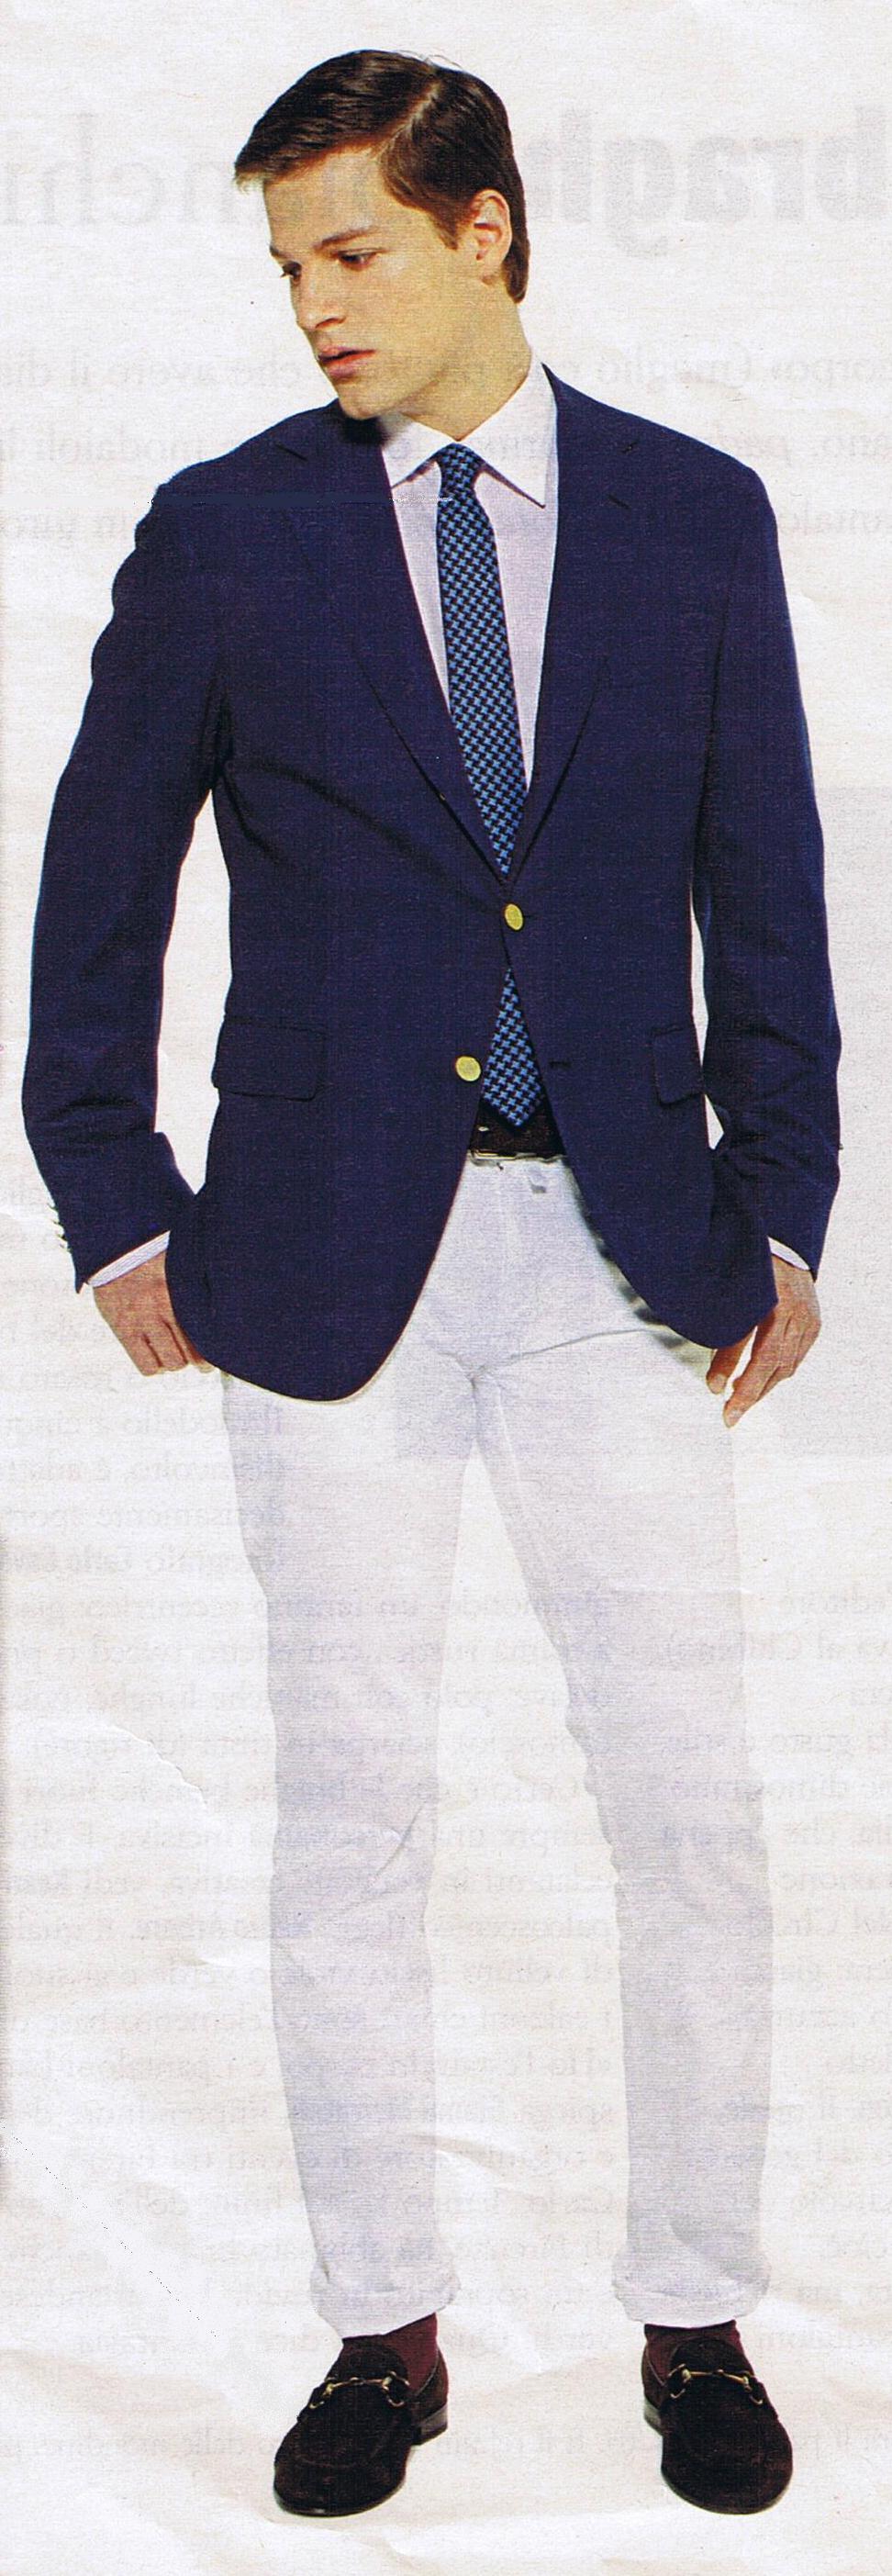 Blazer blu due bottoni con jeans bianco - ph Enzo Ranieri 2674486bfb3